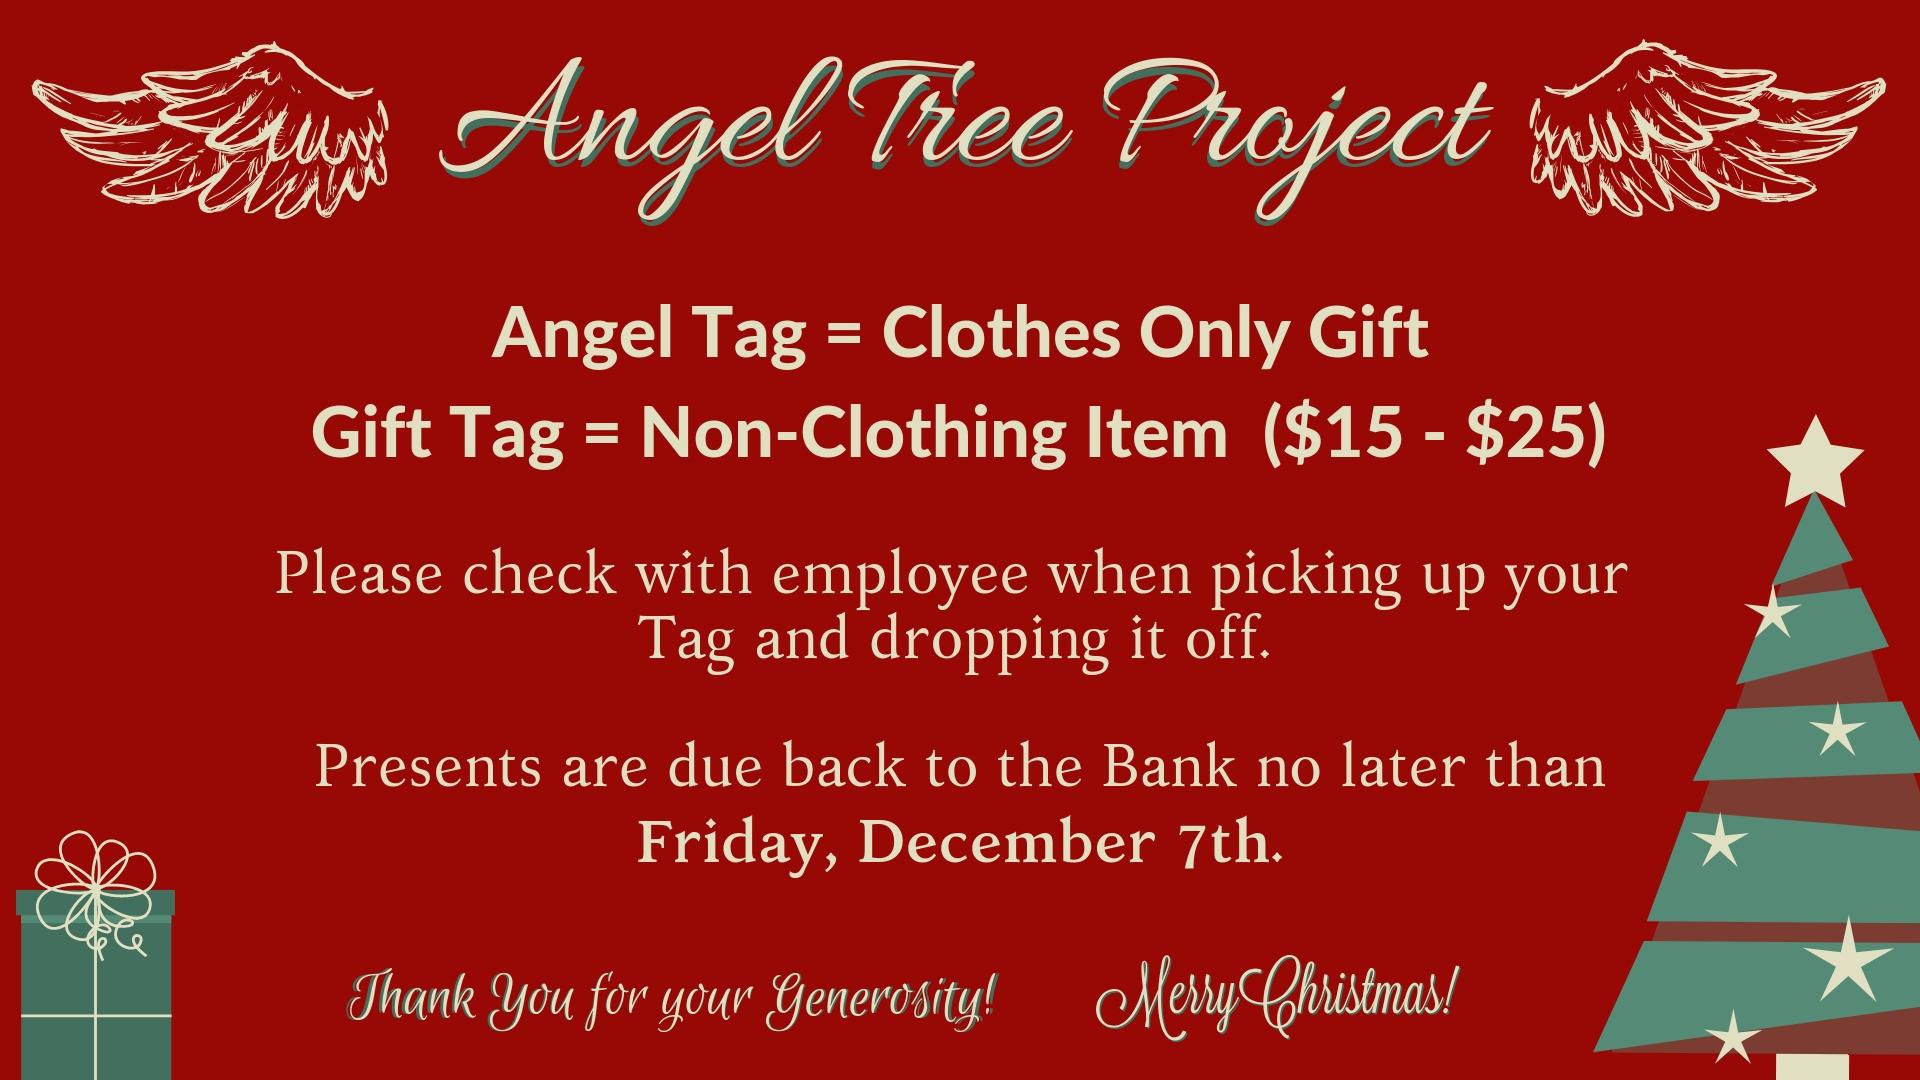 Angel-tree-website-photo.jpg